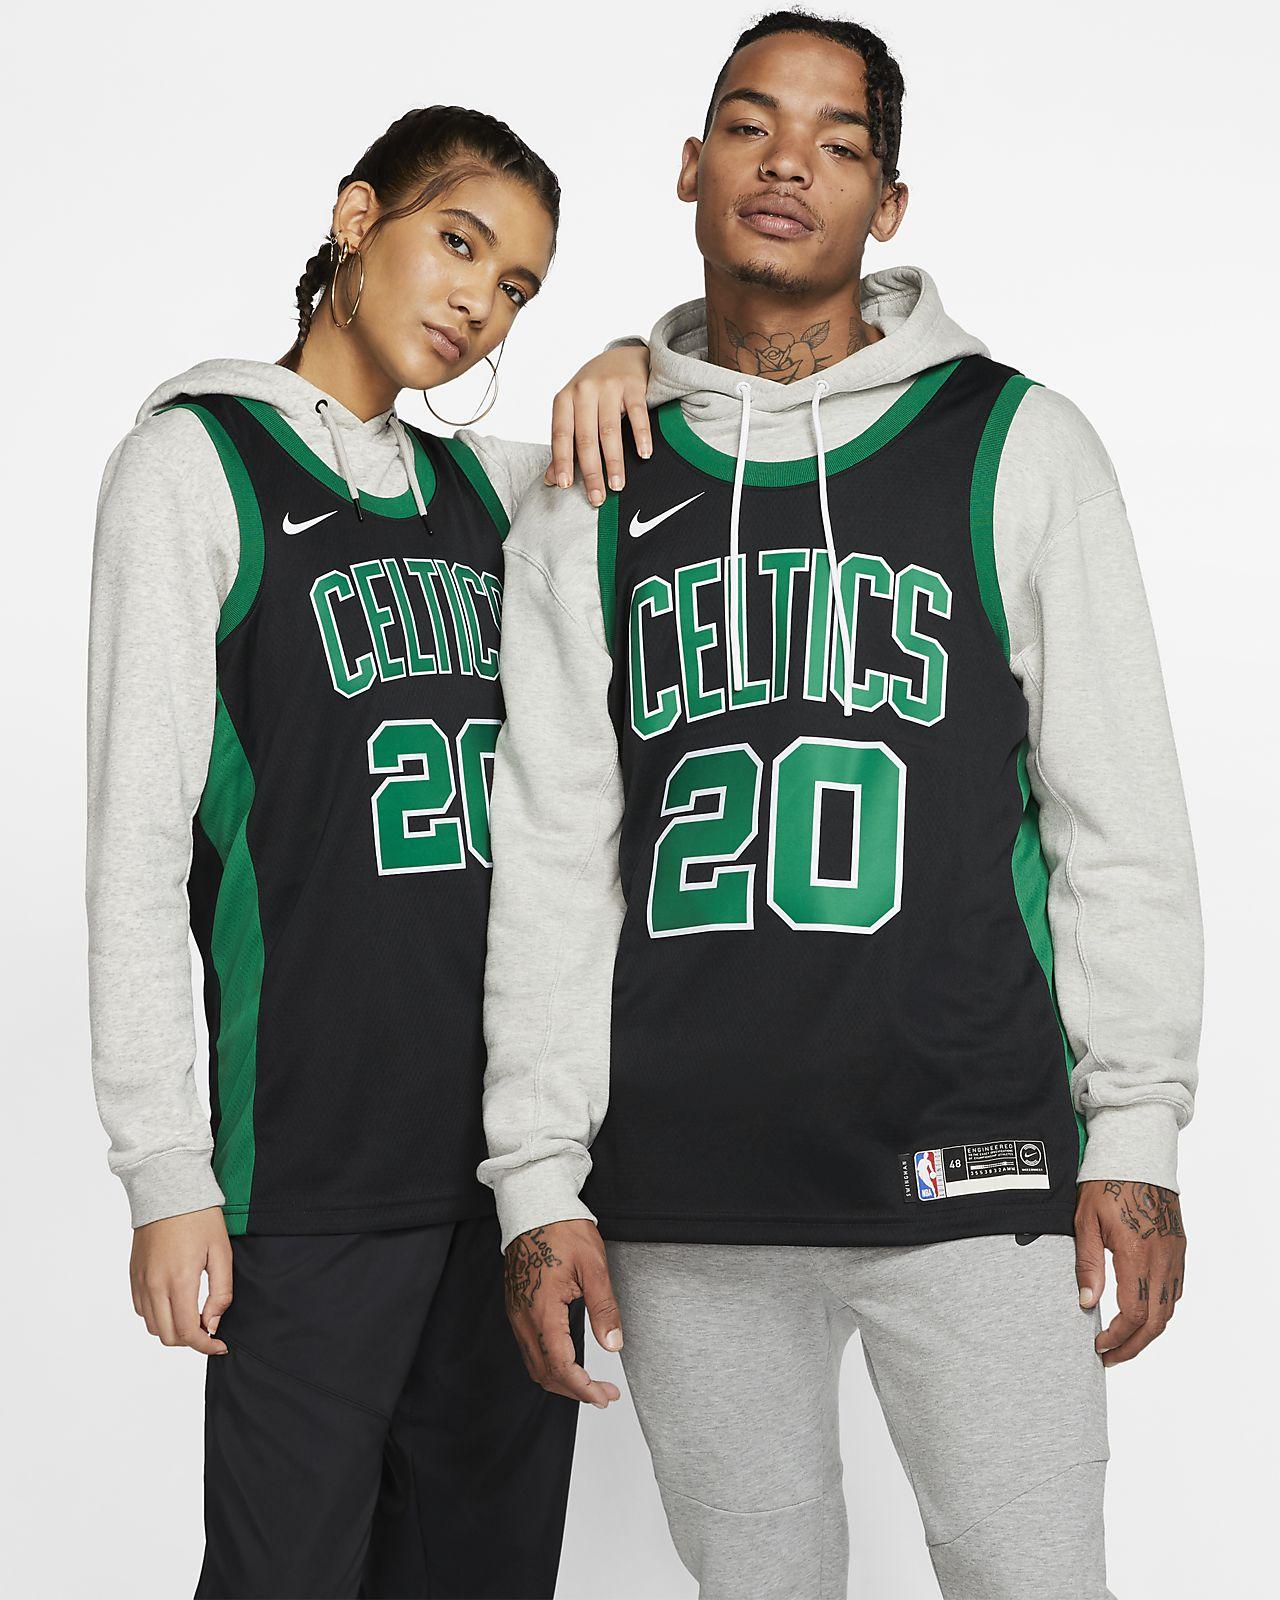 Gordon Hayward Celtics Statement Edition Nike NBA Swingman Jersey